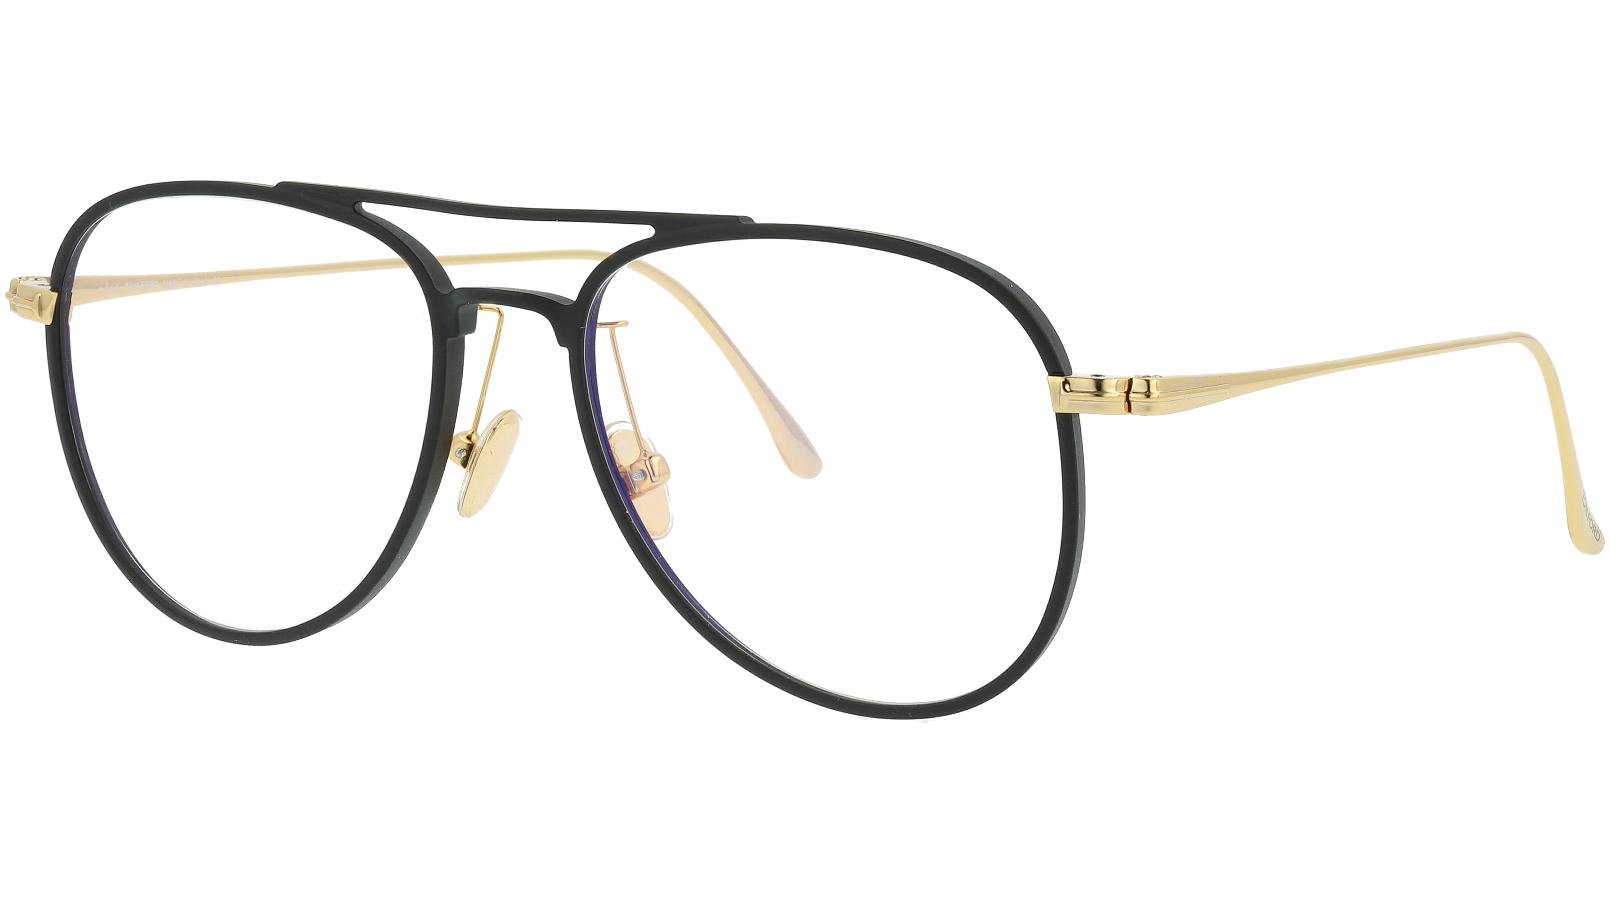 Tom Ford TF5666-B 002 52 Black Glasses